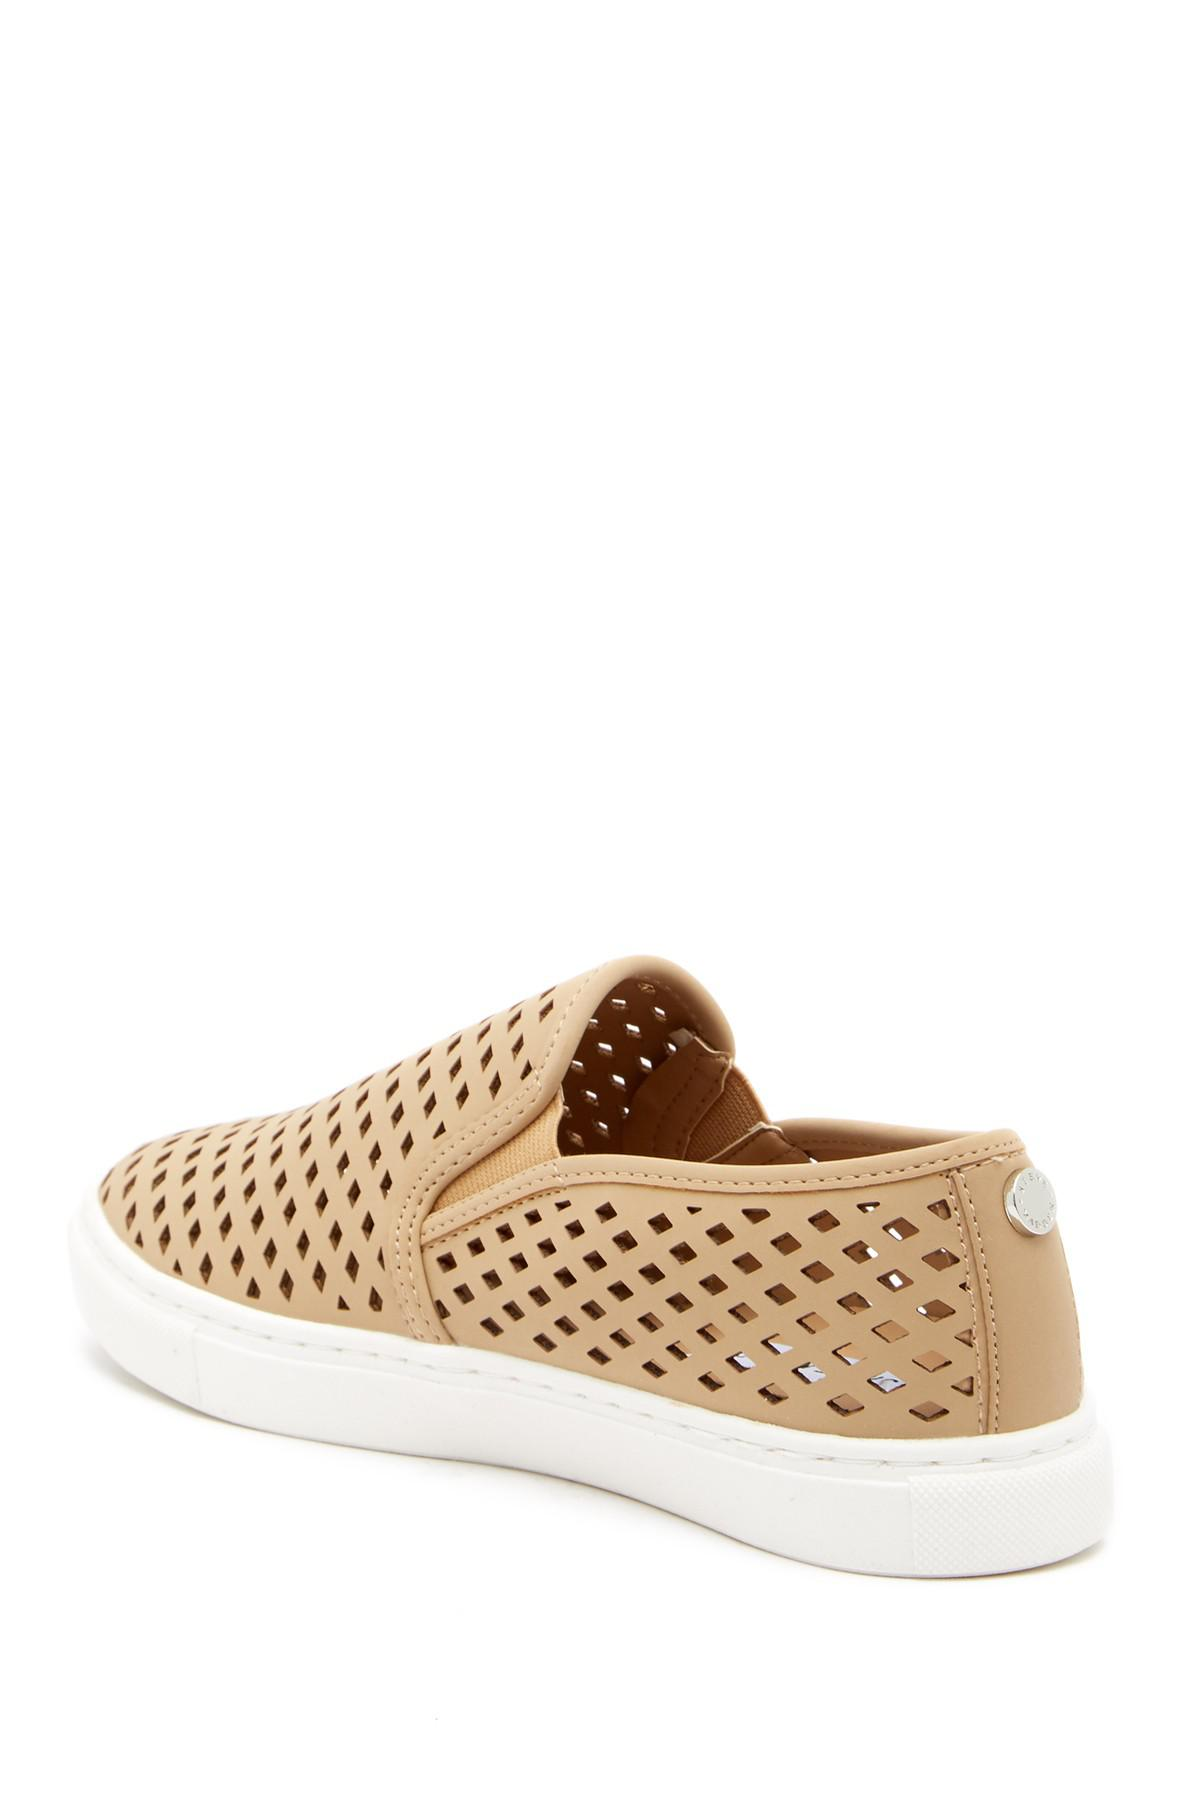 d1a8058b7aa Steve Madden - Natural Zeena Slip-on Sneaker - Lyst. View fullscreen